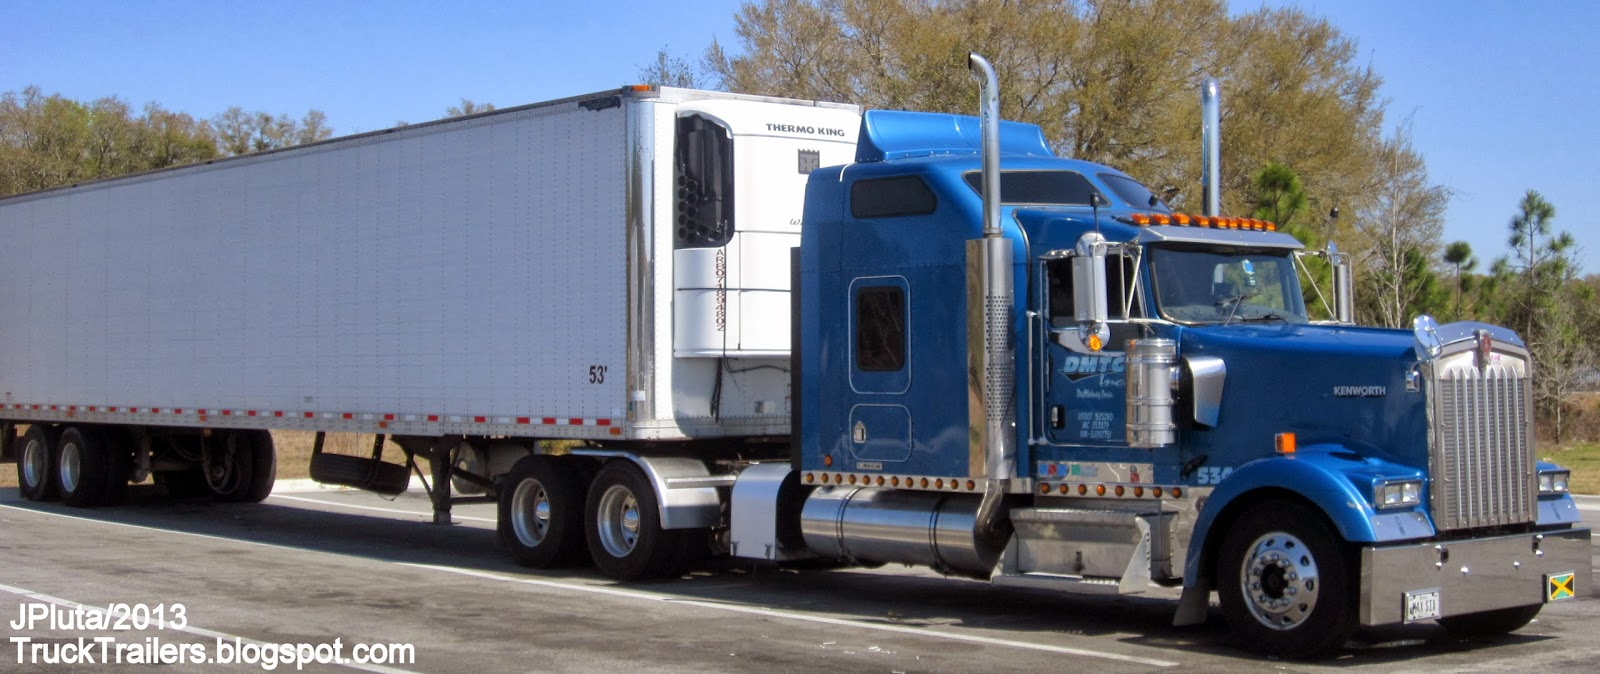 Dmtc inc des moines iowa kenworth sleeper cab truck great dane refrigerated 53 trailer dmtc trucking company ia dmtc inc des moines iowa 4071 121st